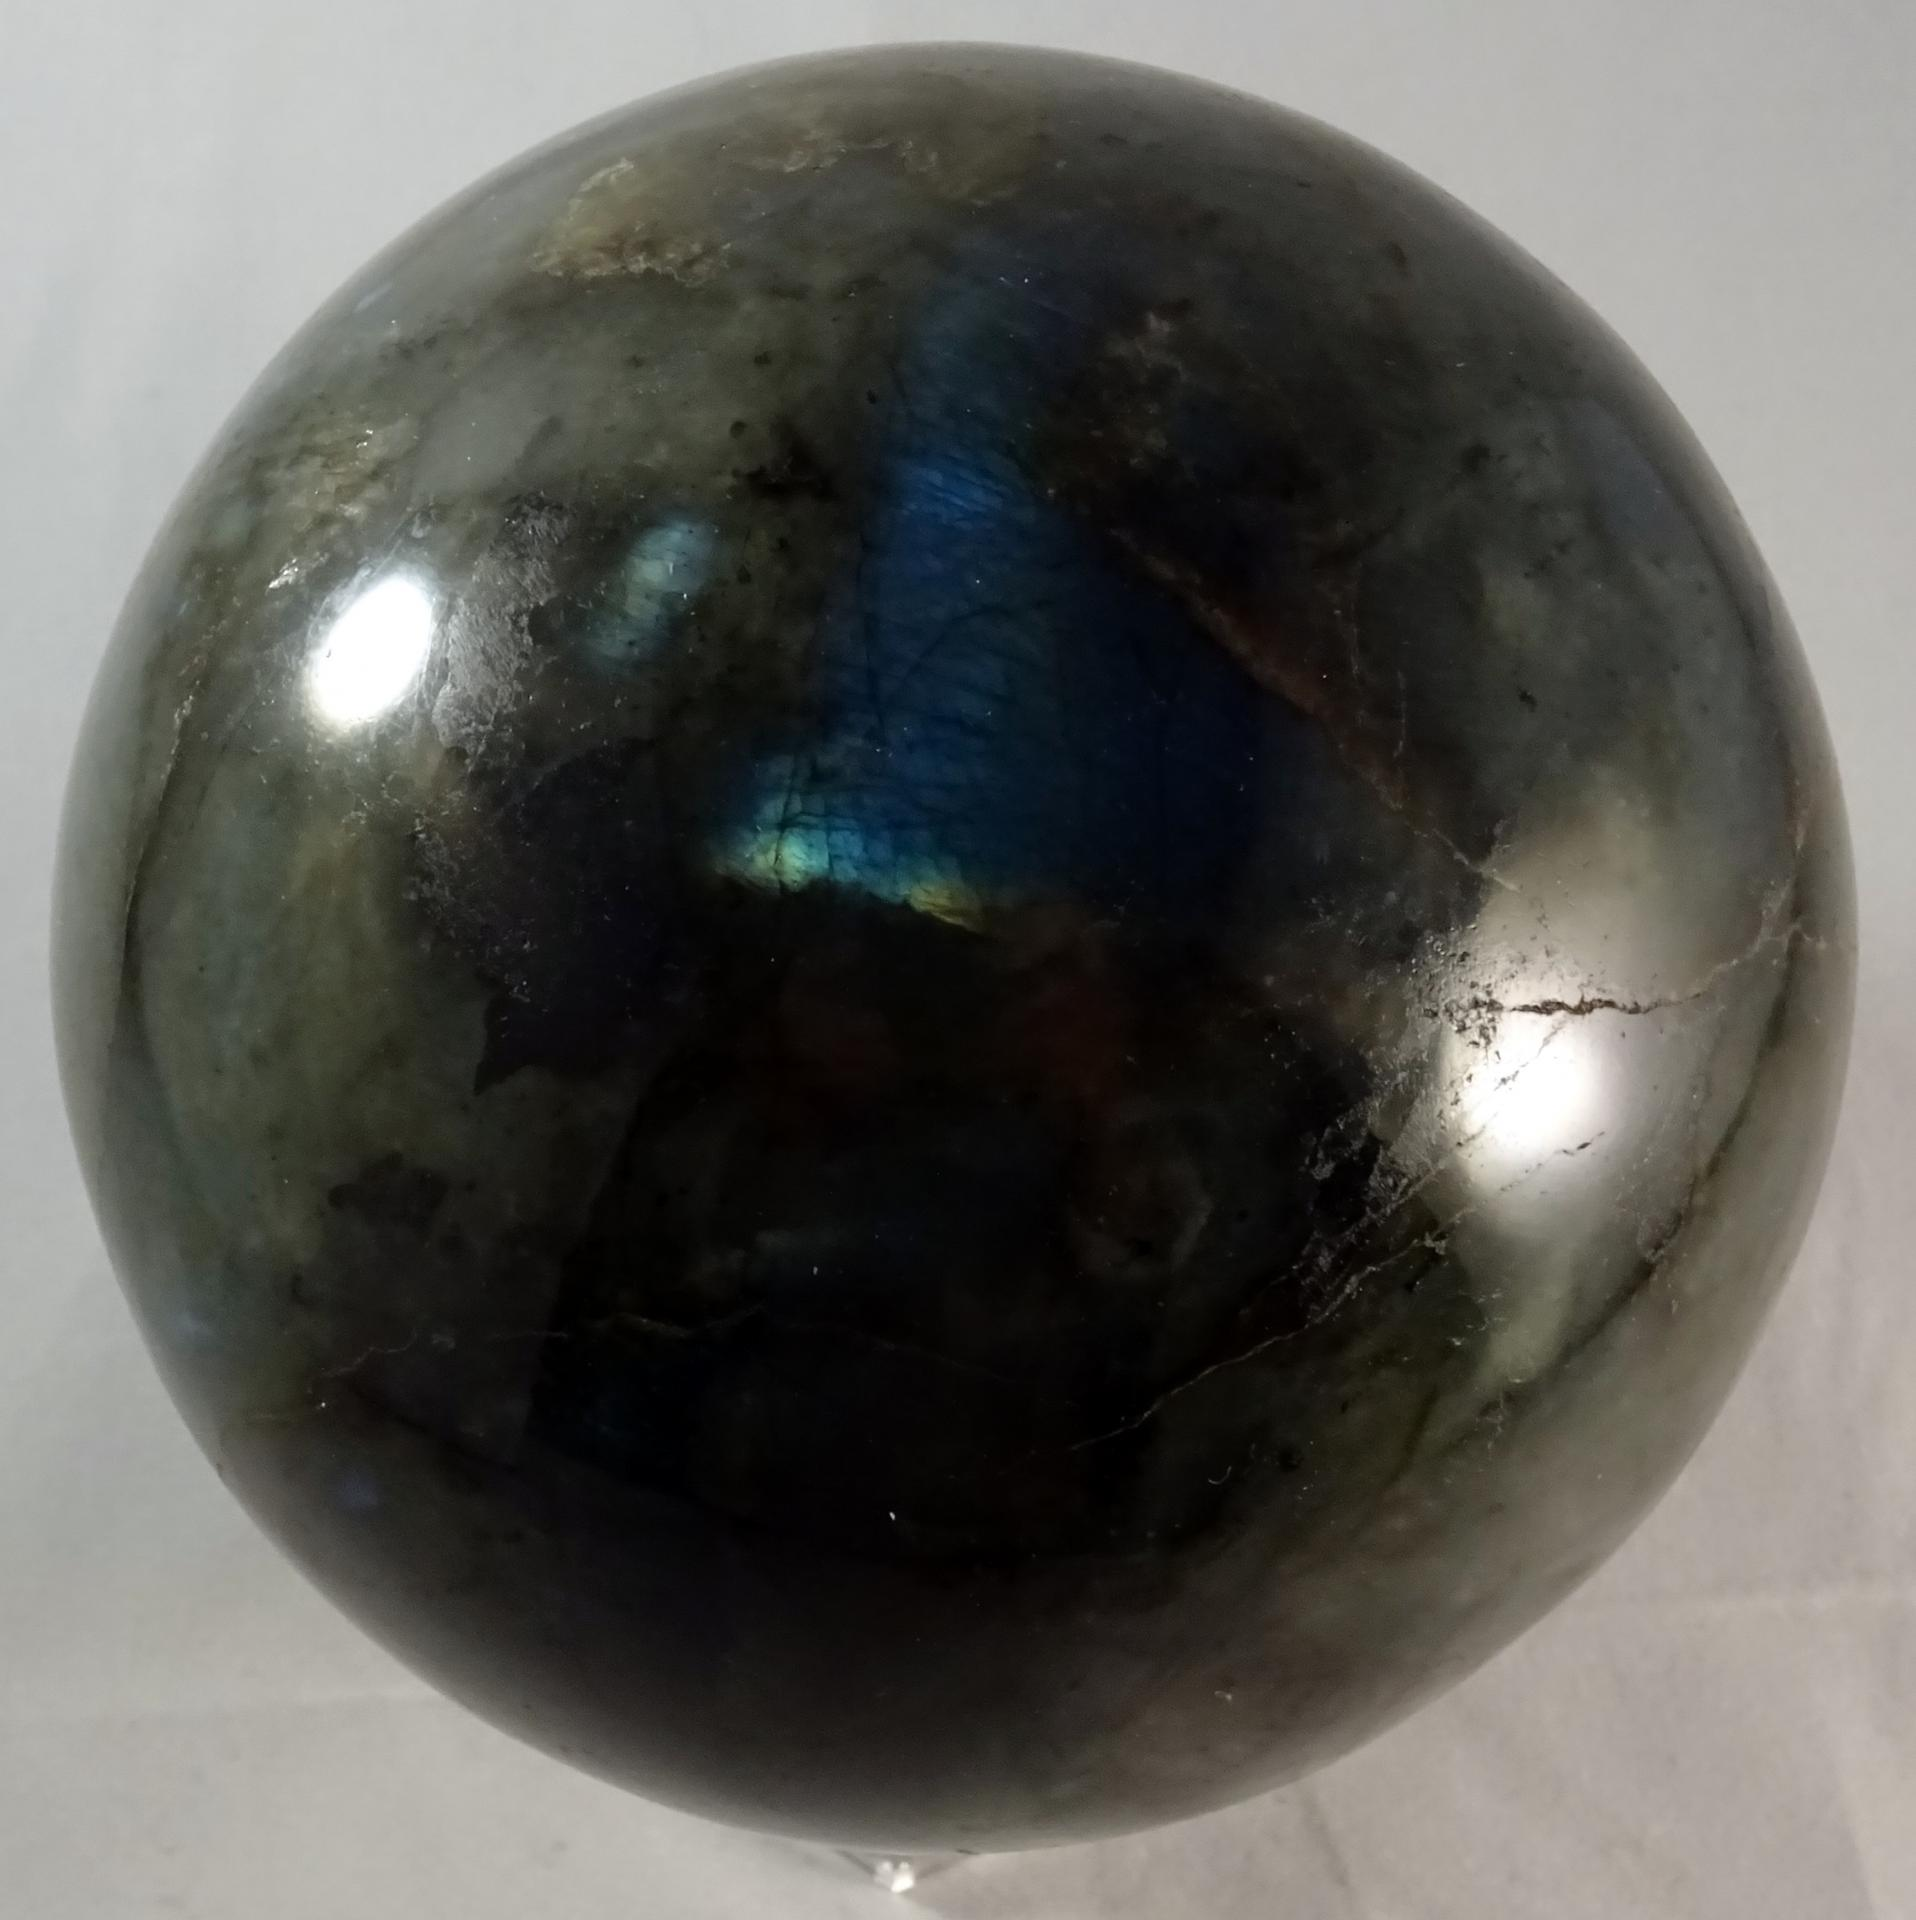 Spherelabra289